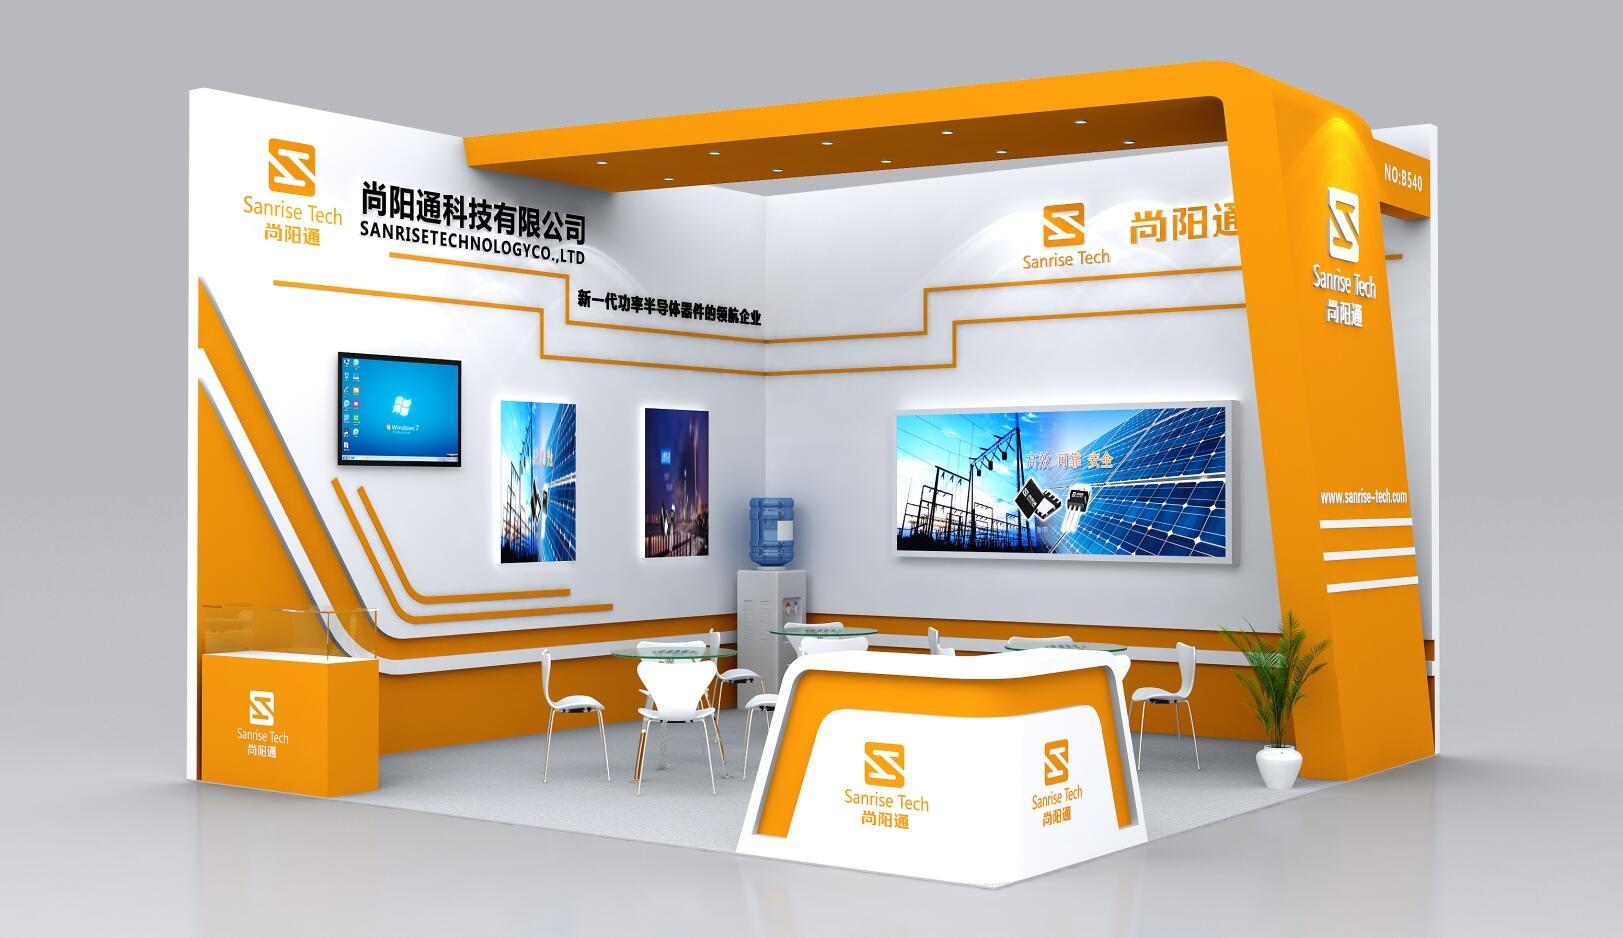 http://www.micehome.cn/uploadfile/product/58/2020/12/25/1608862576.jpg